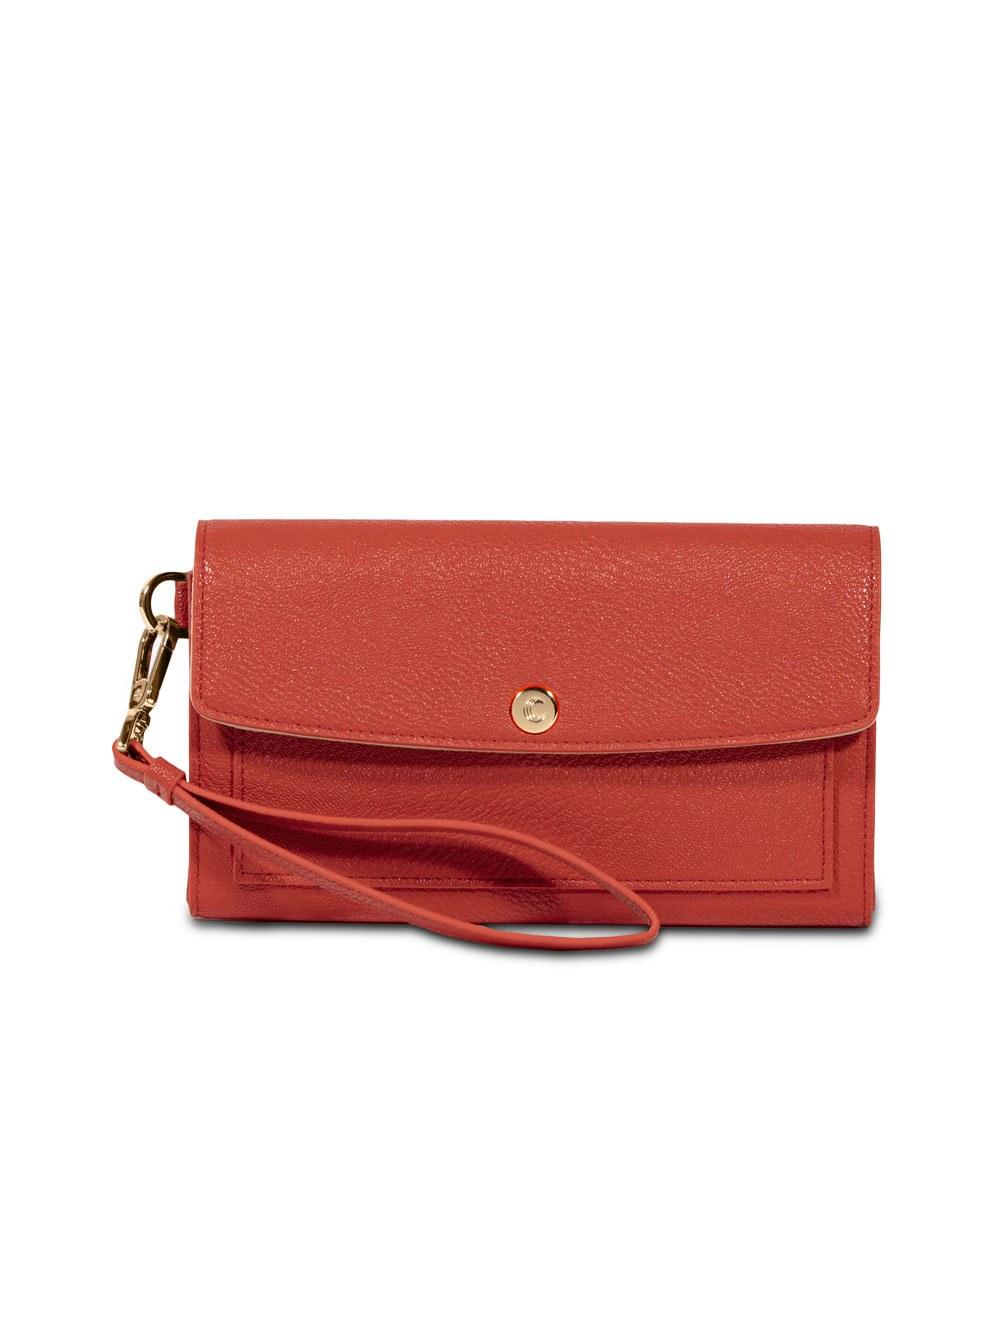 Wallet With Wristlet - Tangerine Tango